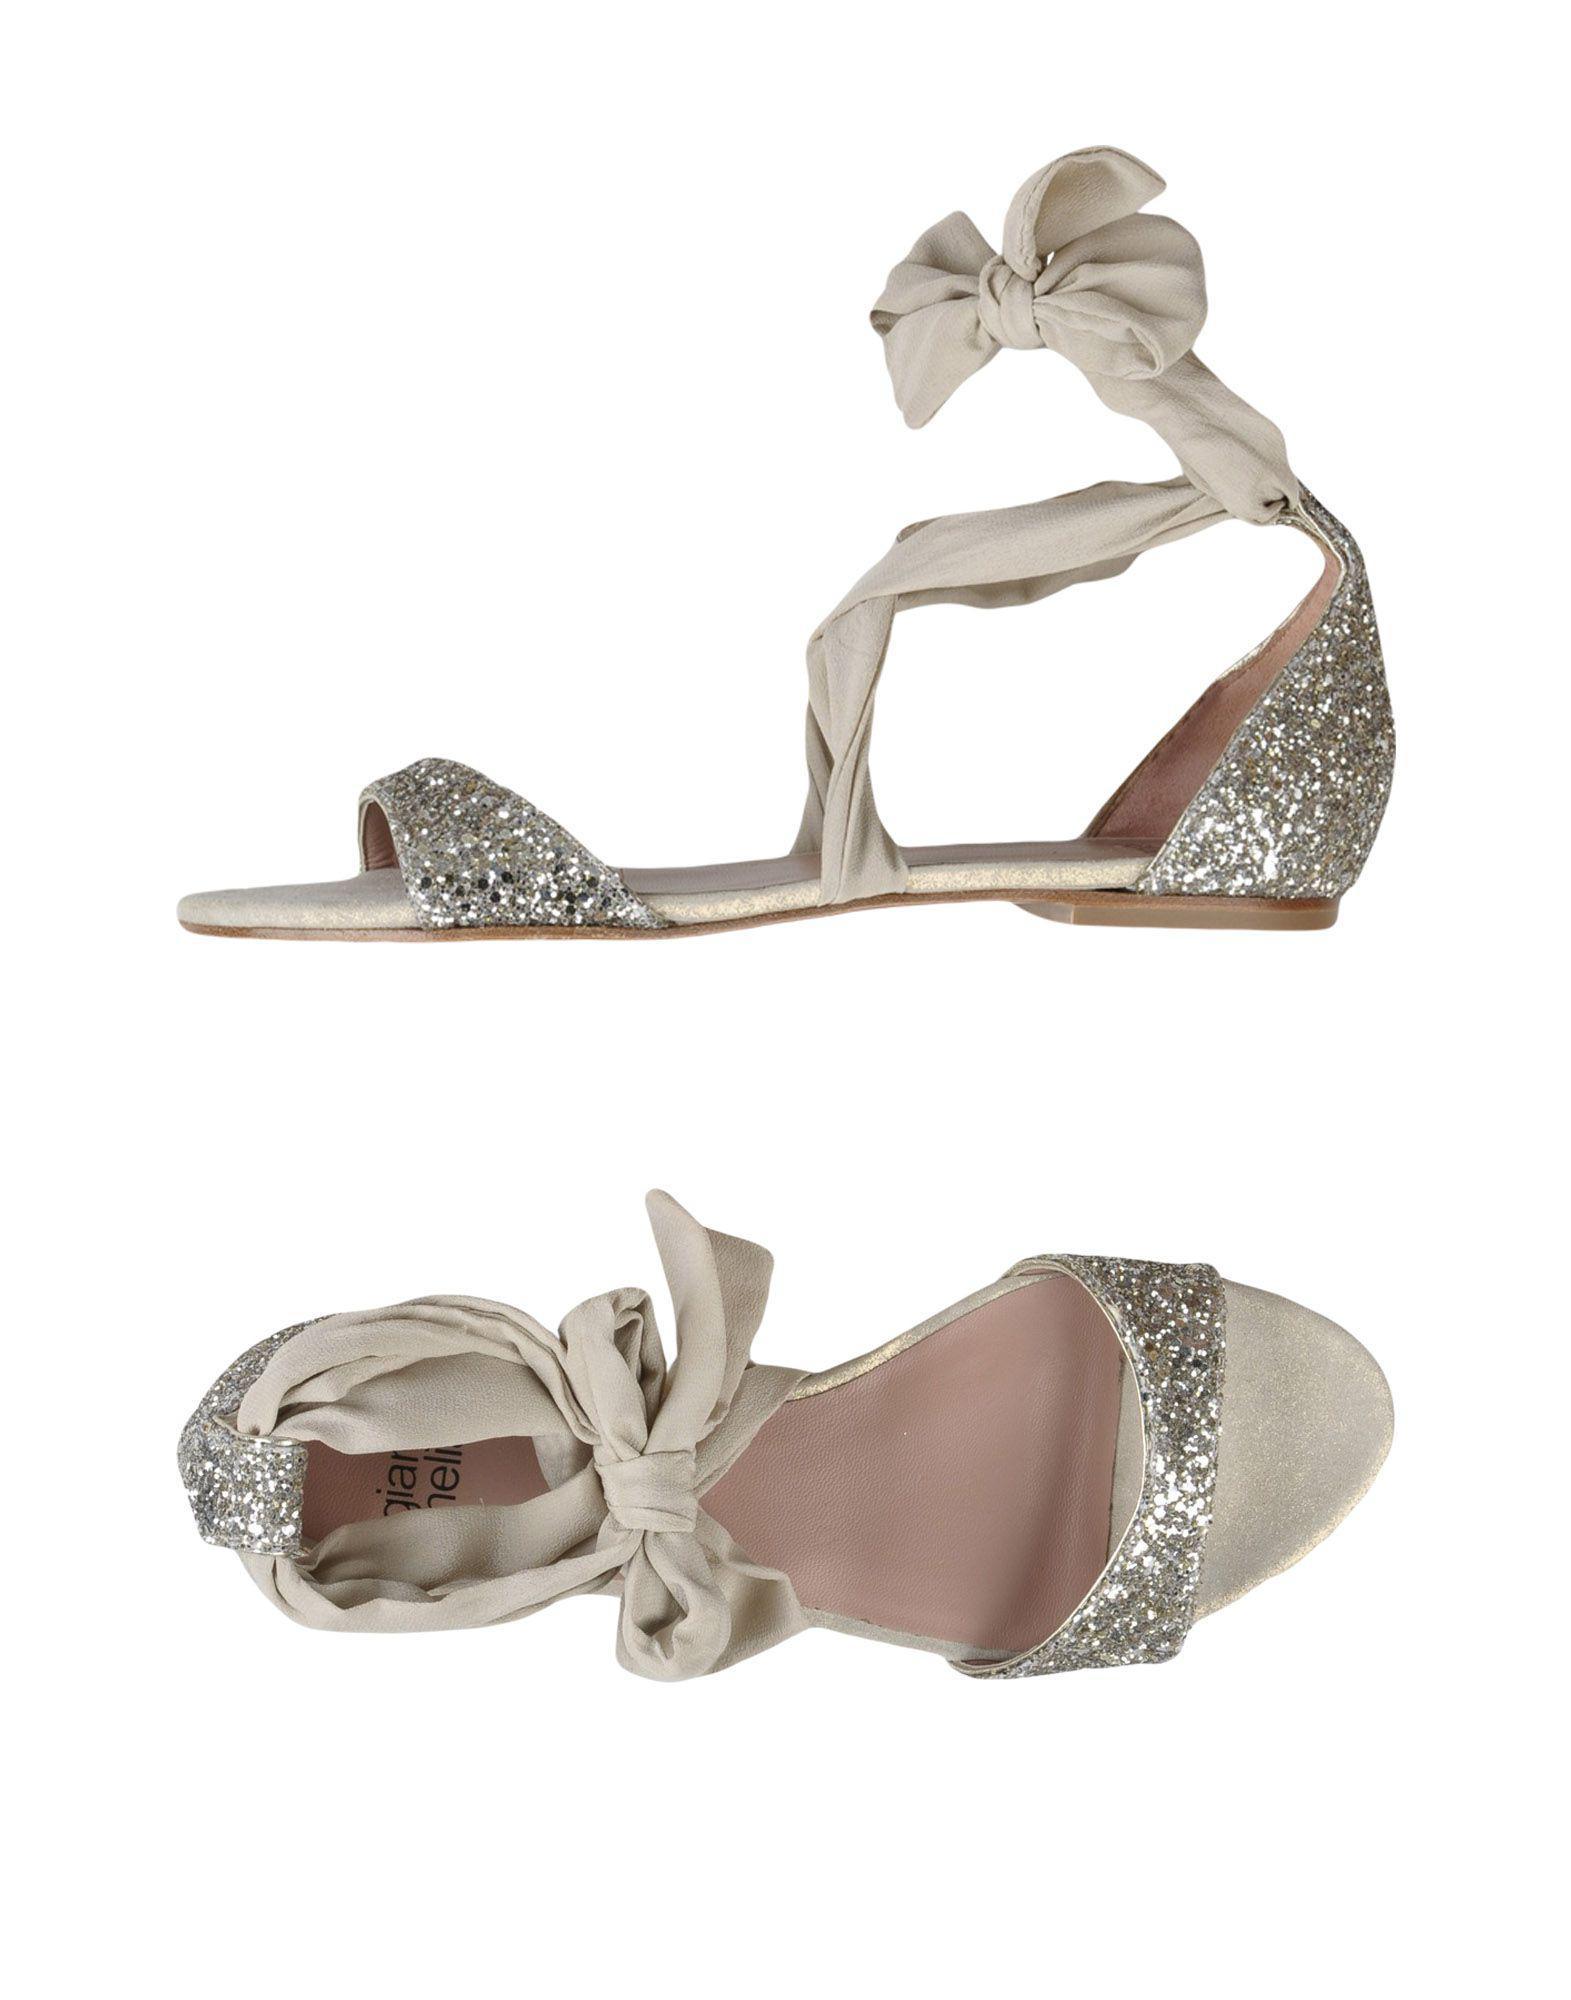 FOOTWEAR - Toe post sandals Gianna Meliani 2rj4A